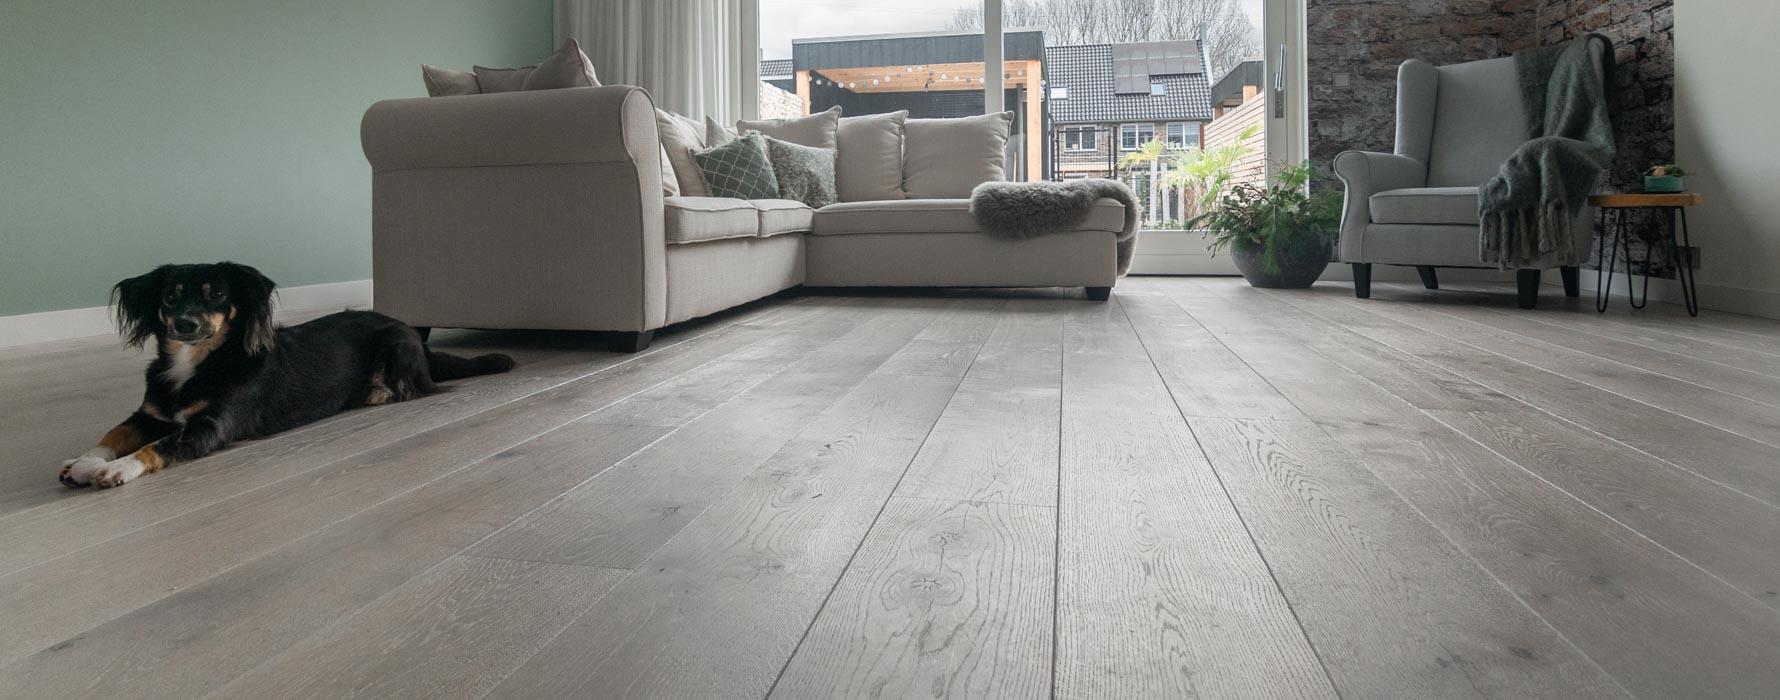 Geschaafde white wash vloer